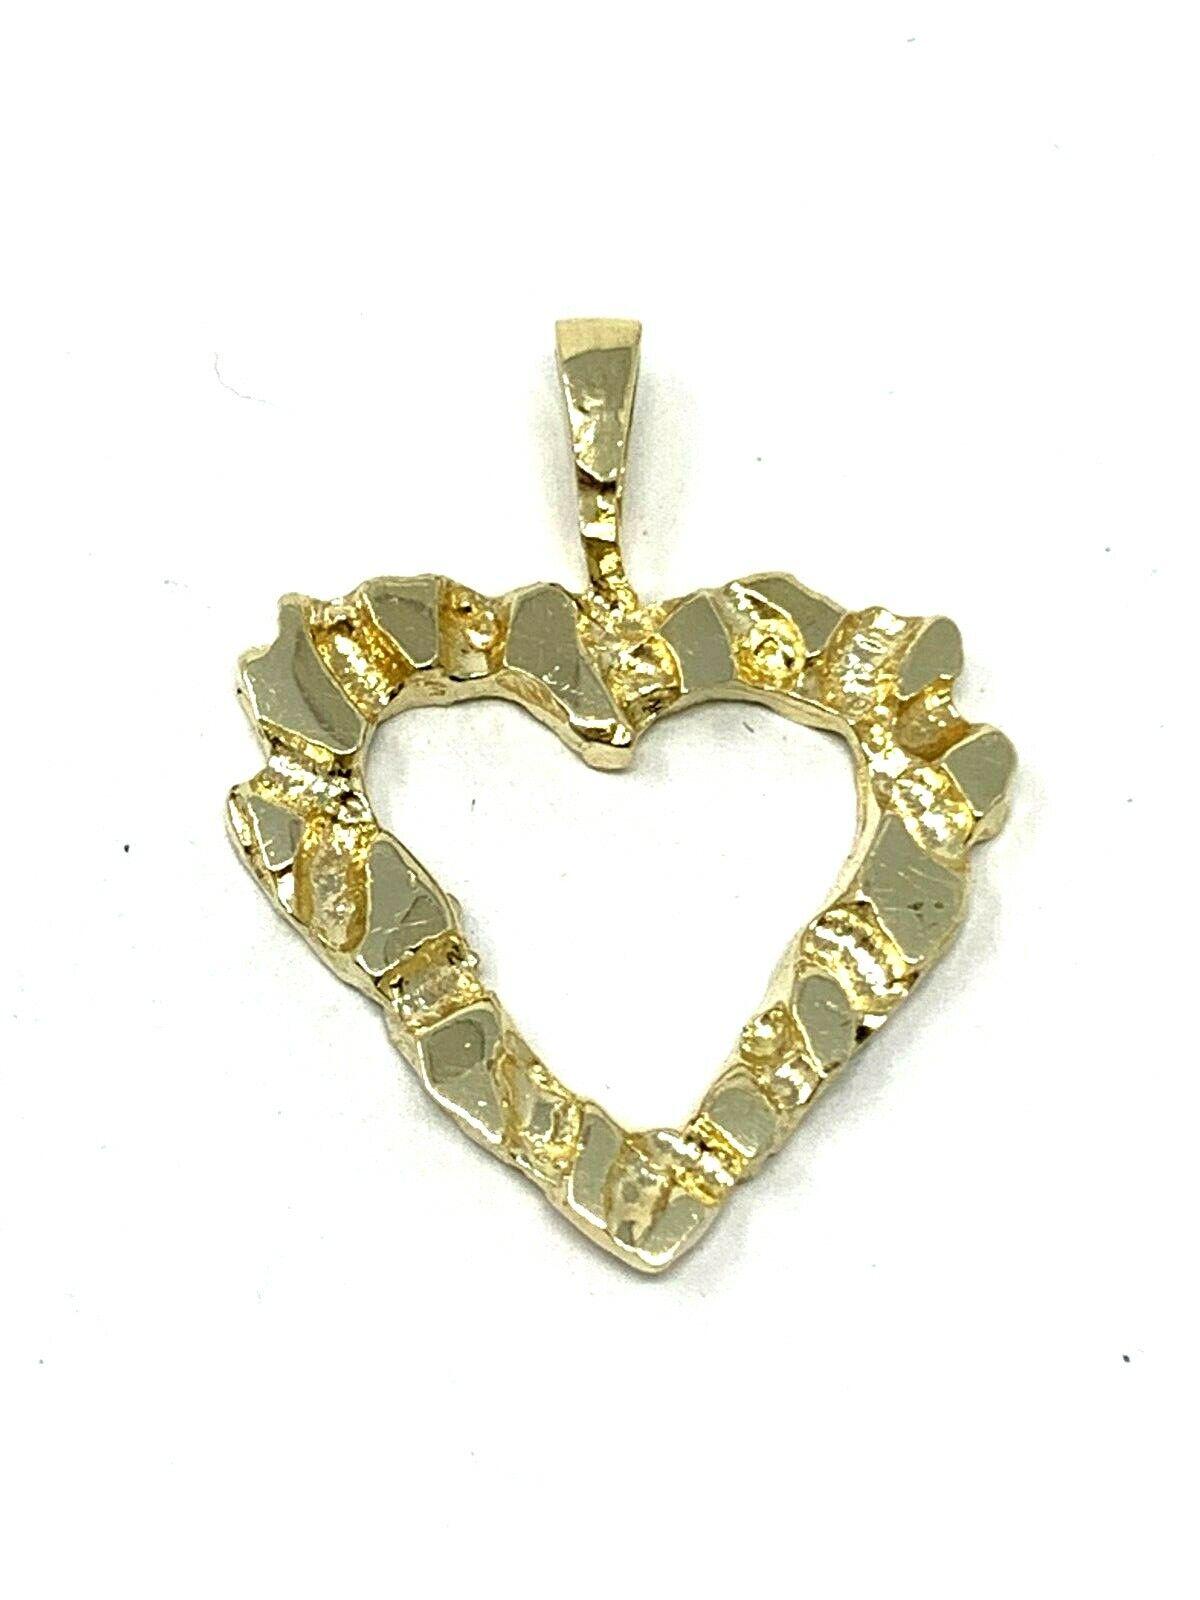 14k Yellow Gold Nugget Heart Charm Pendant 2.3g